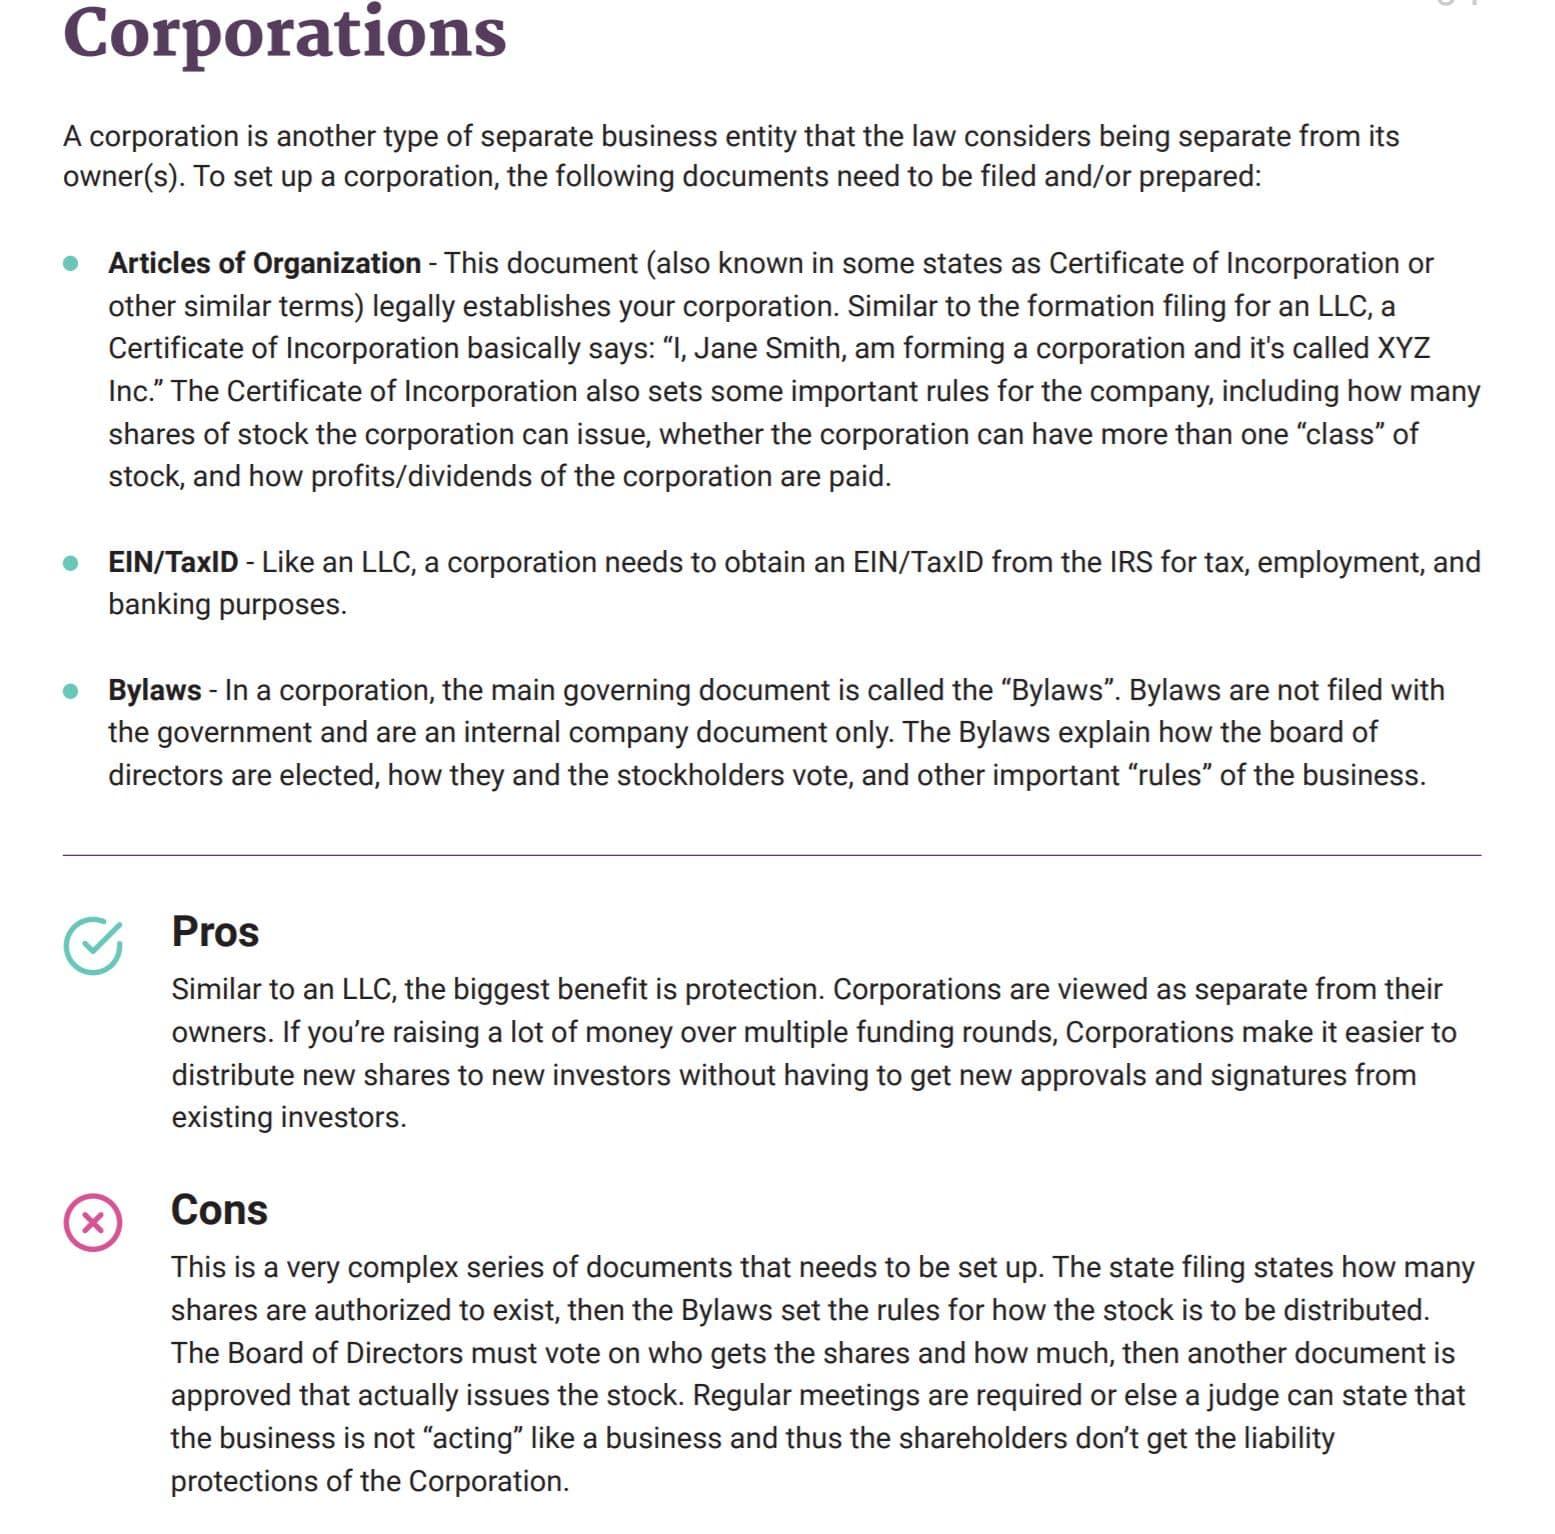 BetterLegal Corporations